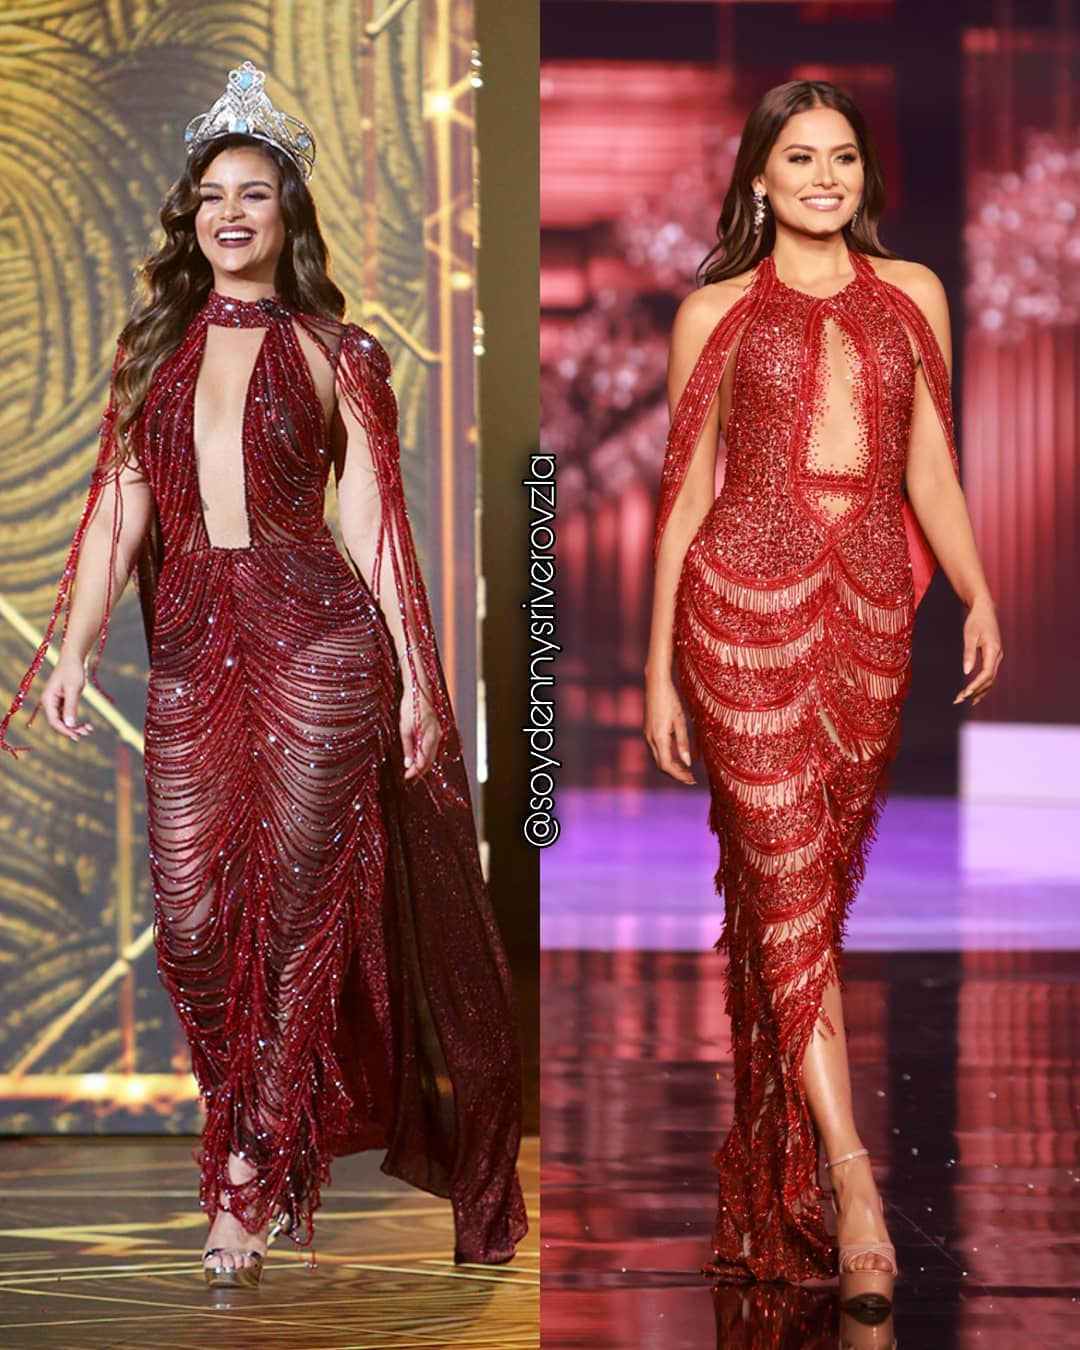 vestidos parecidos: miss universe & nblatina vip 2016. 211346367_191224519_1164094037371915_4602413509413114220_n-jpg-tp-1-_nc_ht-scontent-gig2-1